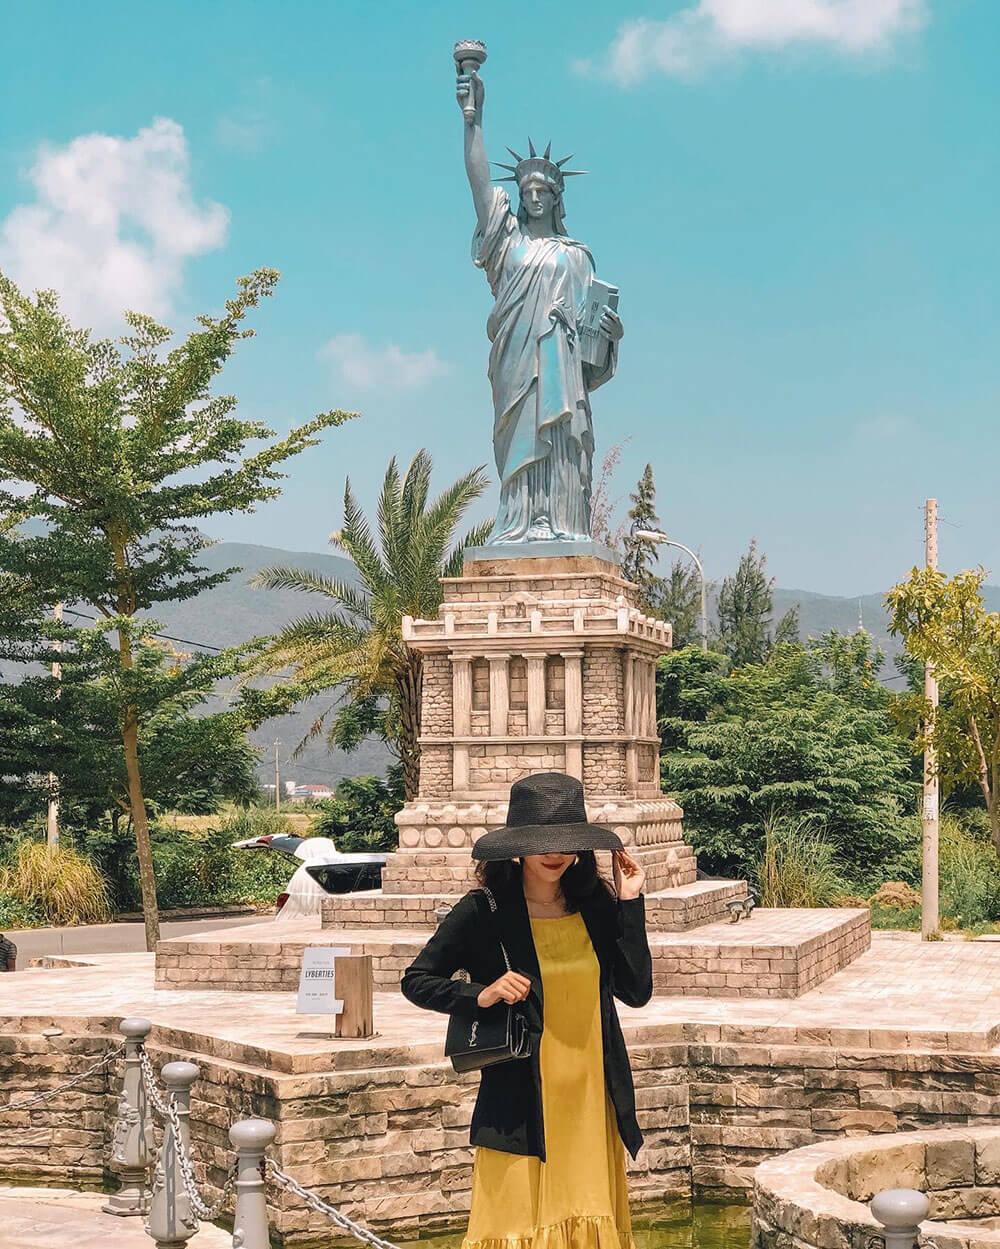 Cong Vien Ky Quan The Gioi Khach San Danang Golden Bay Review Hue Da Nang Hoi An Ninh Binh 7n7d Chi Voi 8 Trieu Tin Duoc Khong 04